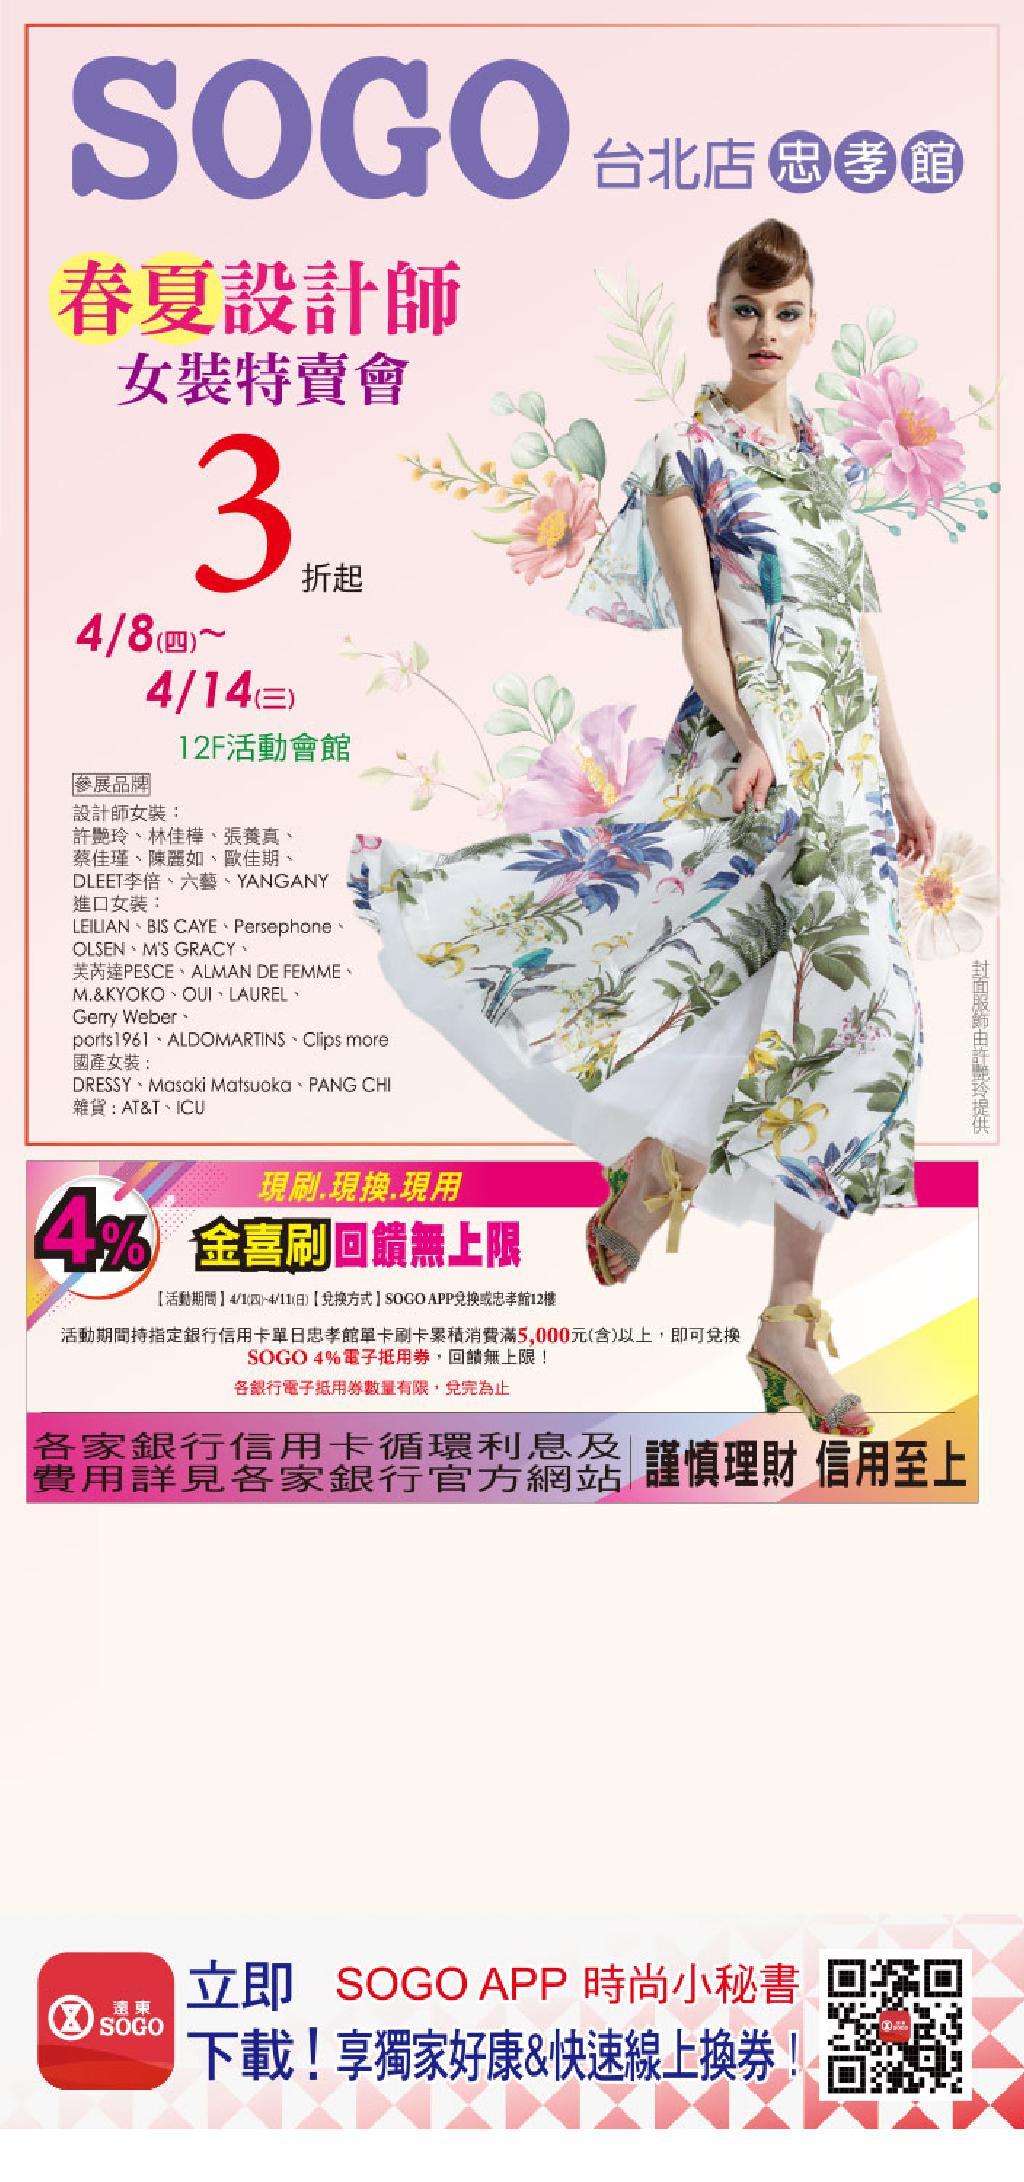 SOGO《台北忠孝館》DM 「12F活動會館「春夏設計師女裝特賣會3折起 」」【2021/4/14 止】